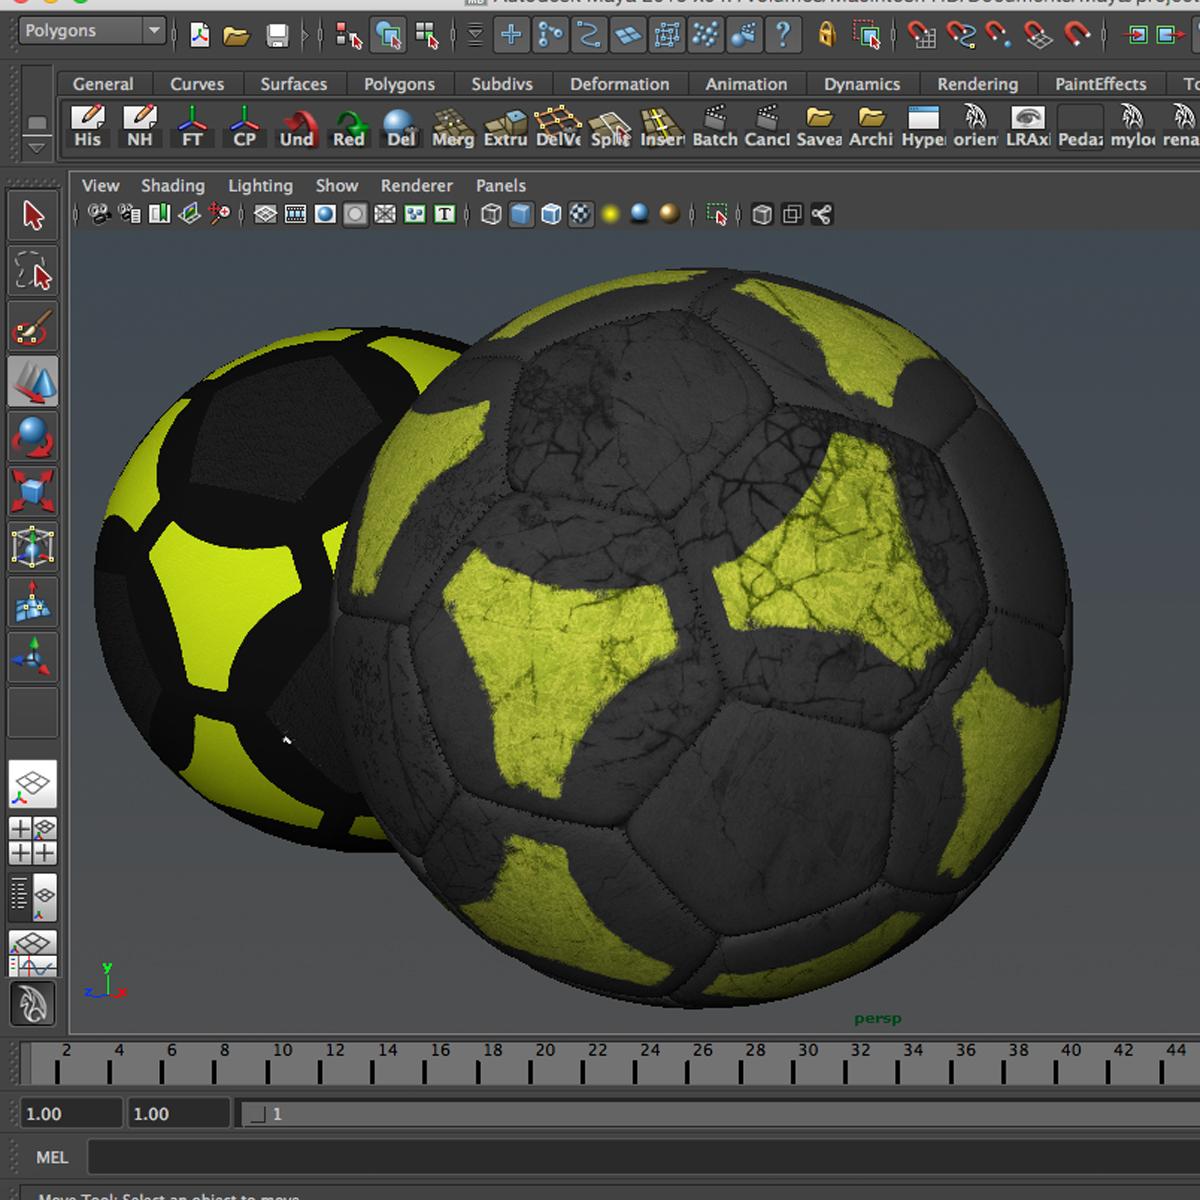 soccerball black yellow 3d model 3ds max fbx c4d ma mb obj 204214